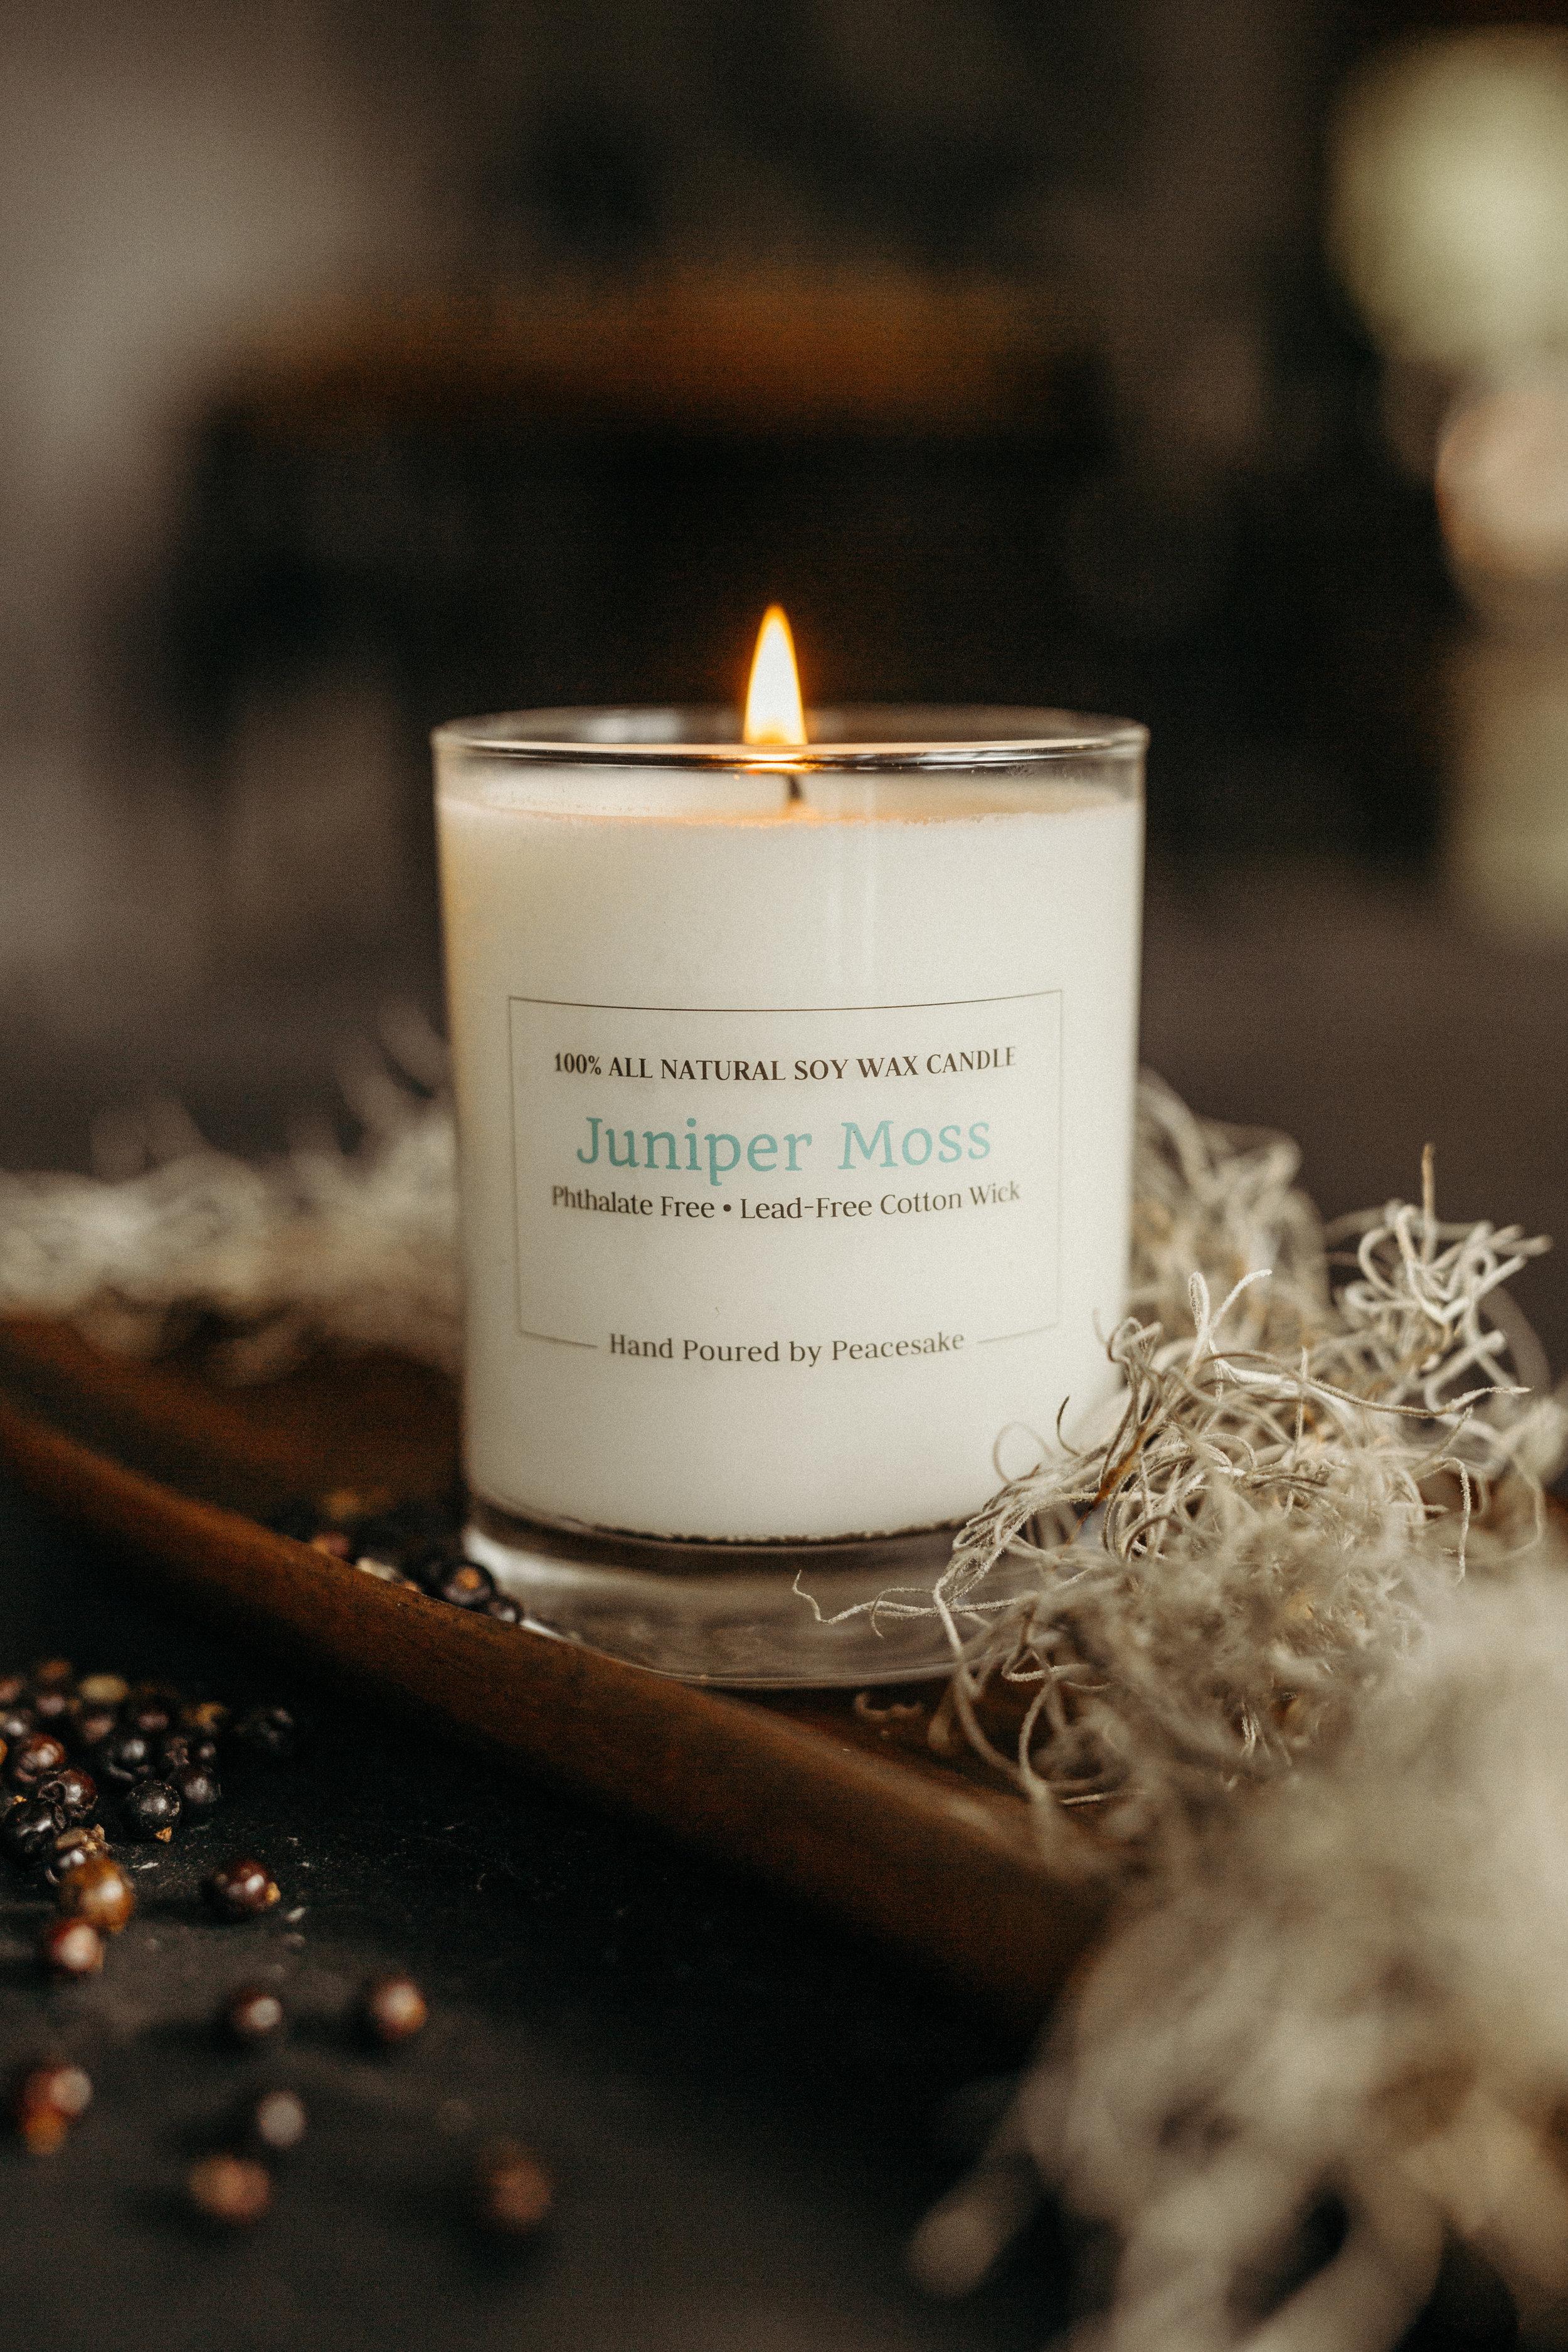 peacesake-phthalate-free-soy-wax-candle-juniper-moss-cotton-wick